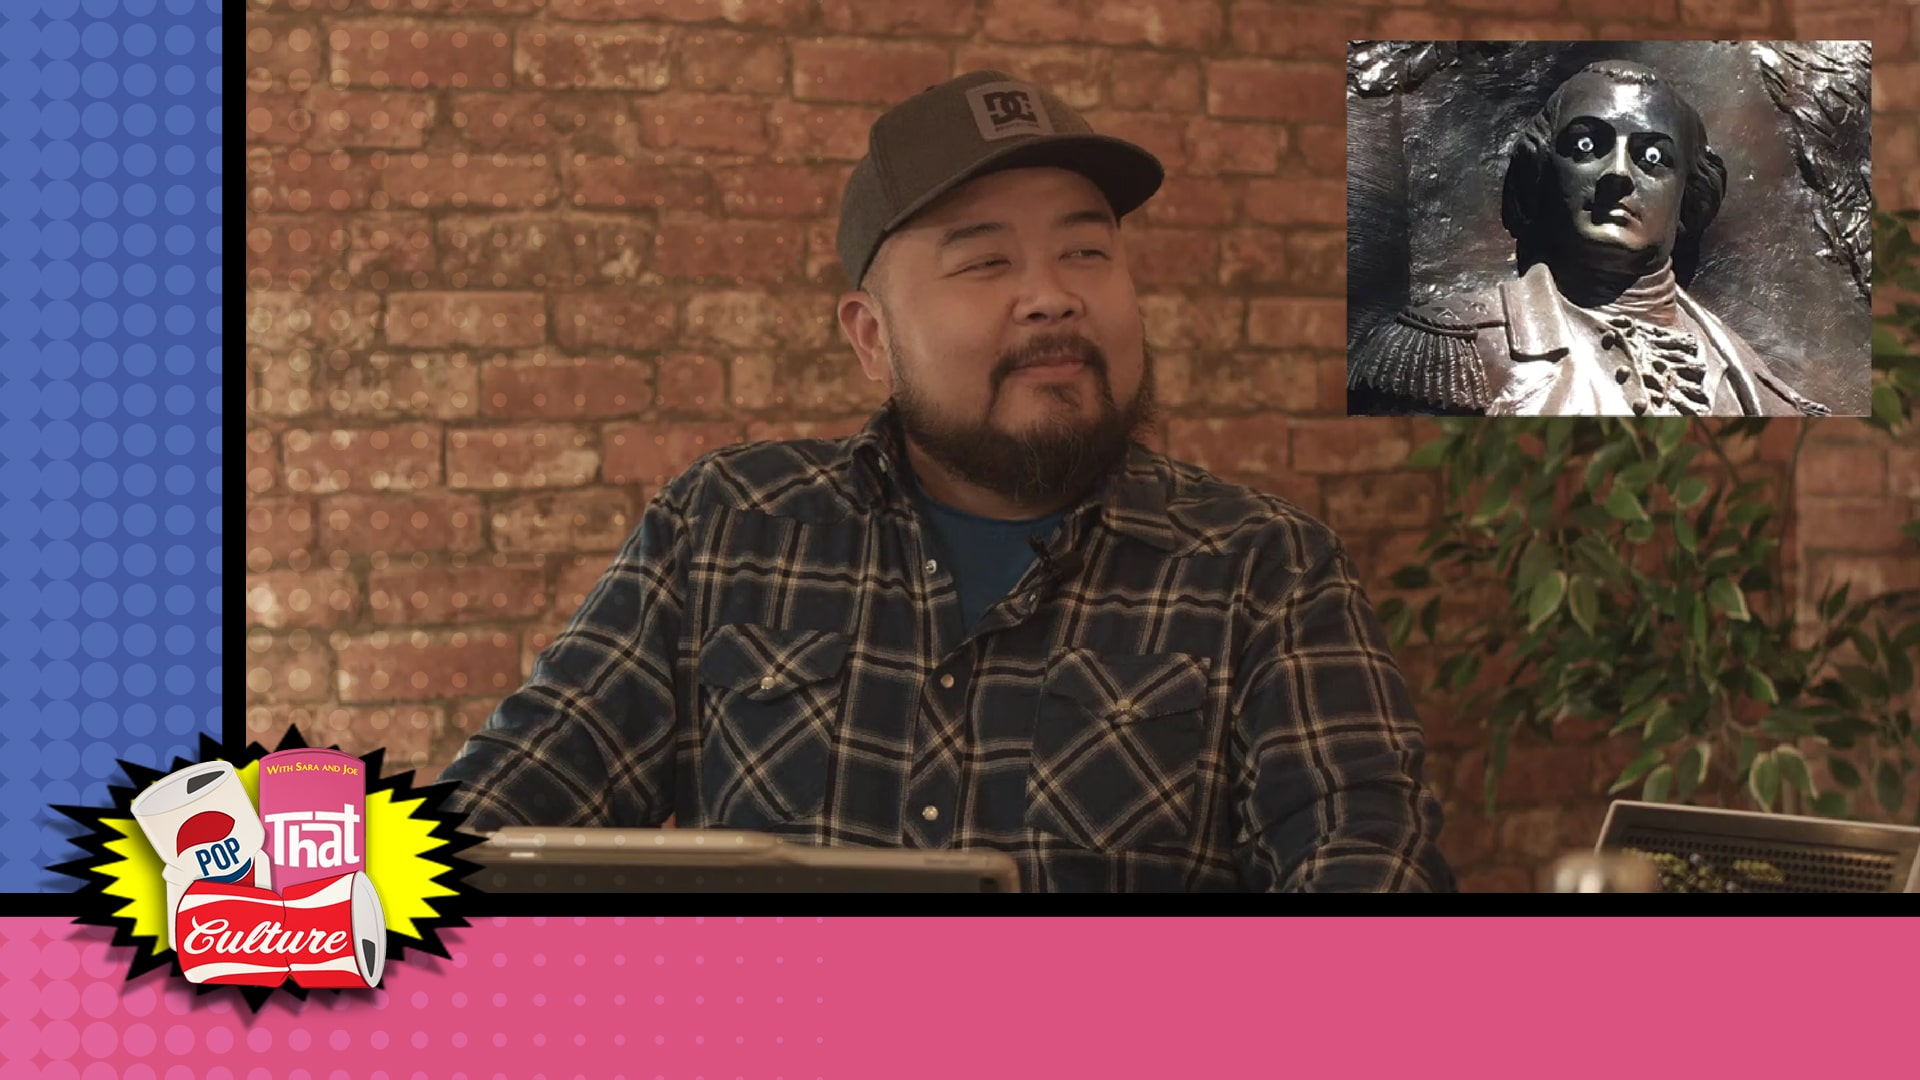 Pop That Culture - Episode 120